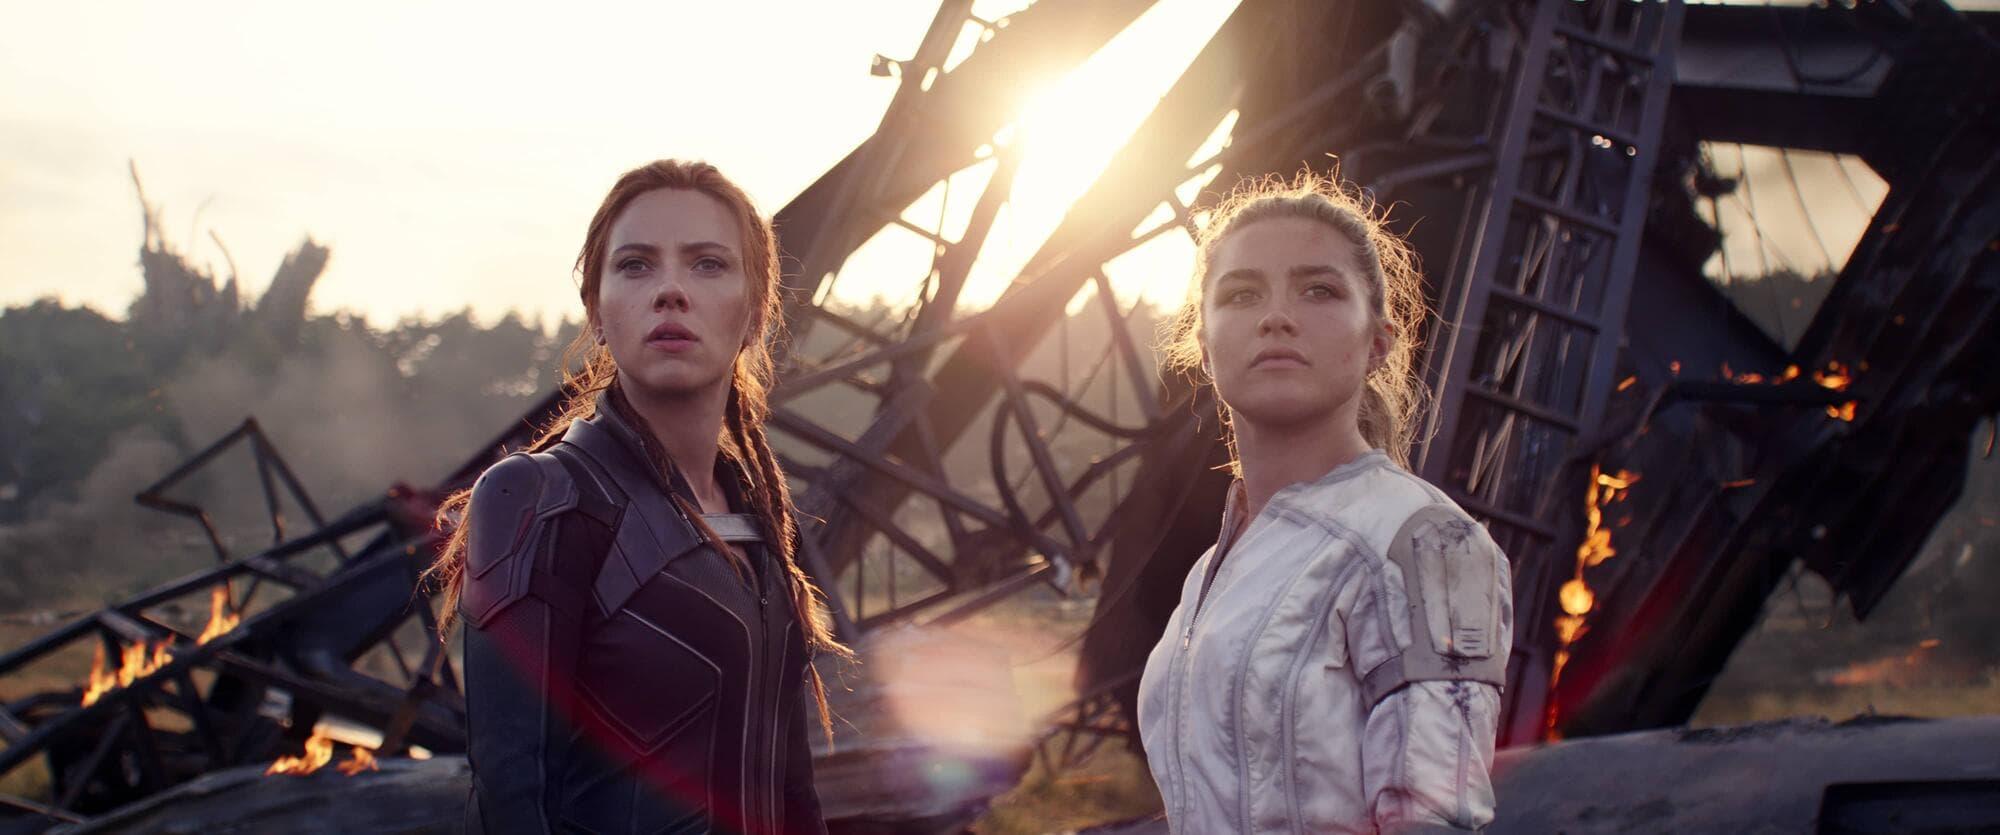 Scarlett Johansson, Florence Pugh, Black Widow, Marvel